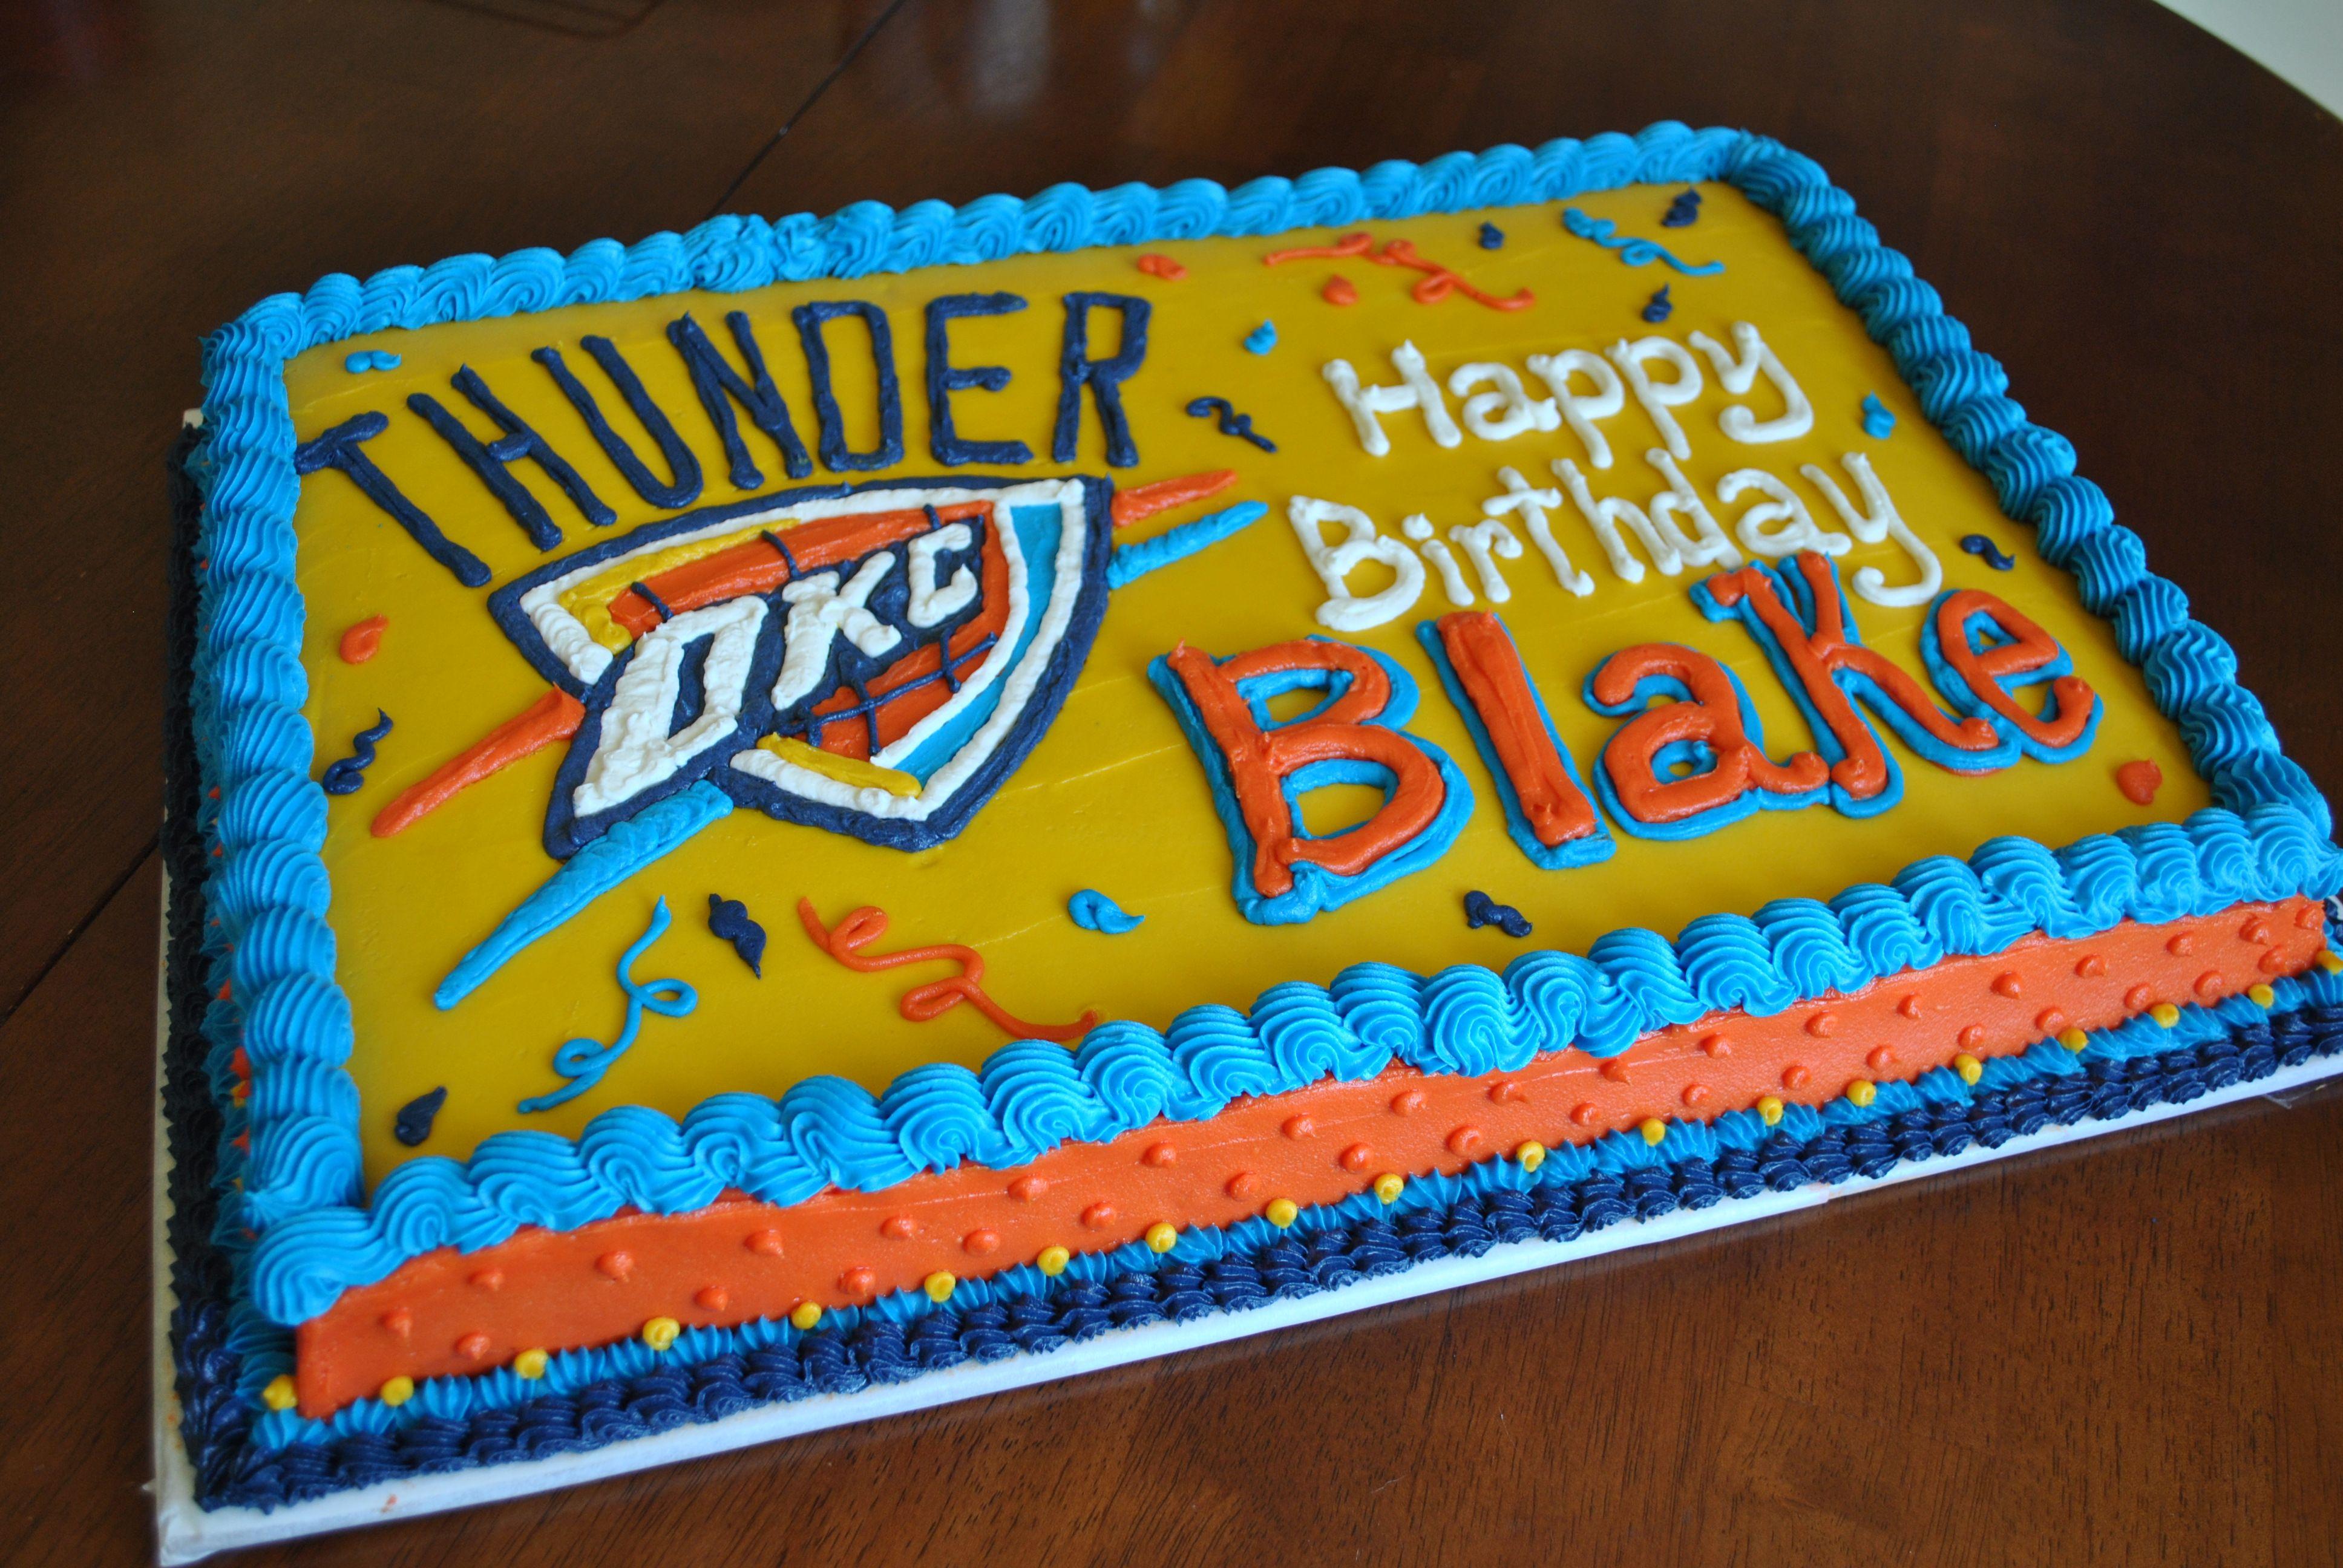 Astonishing Oklahoma City Thunder Birthday Cake Facebook Com Birthday Cards Printable Inklcafe Filternl